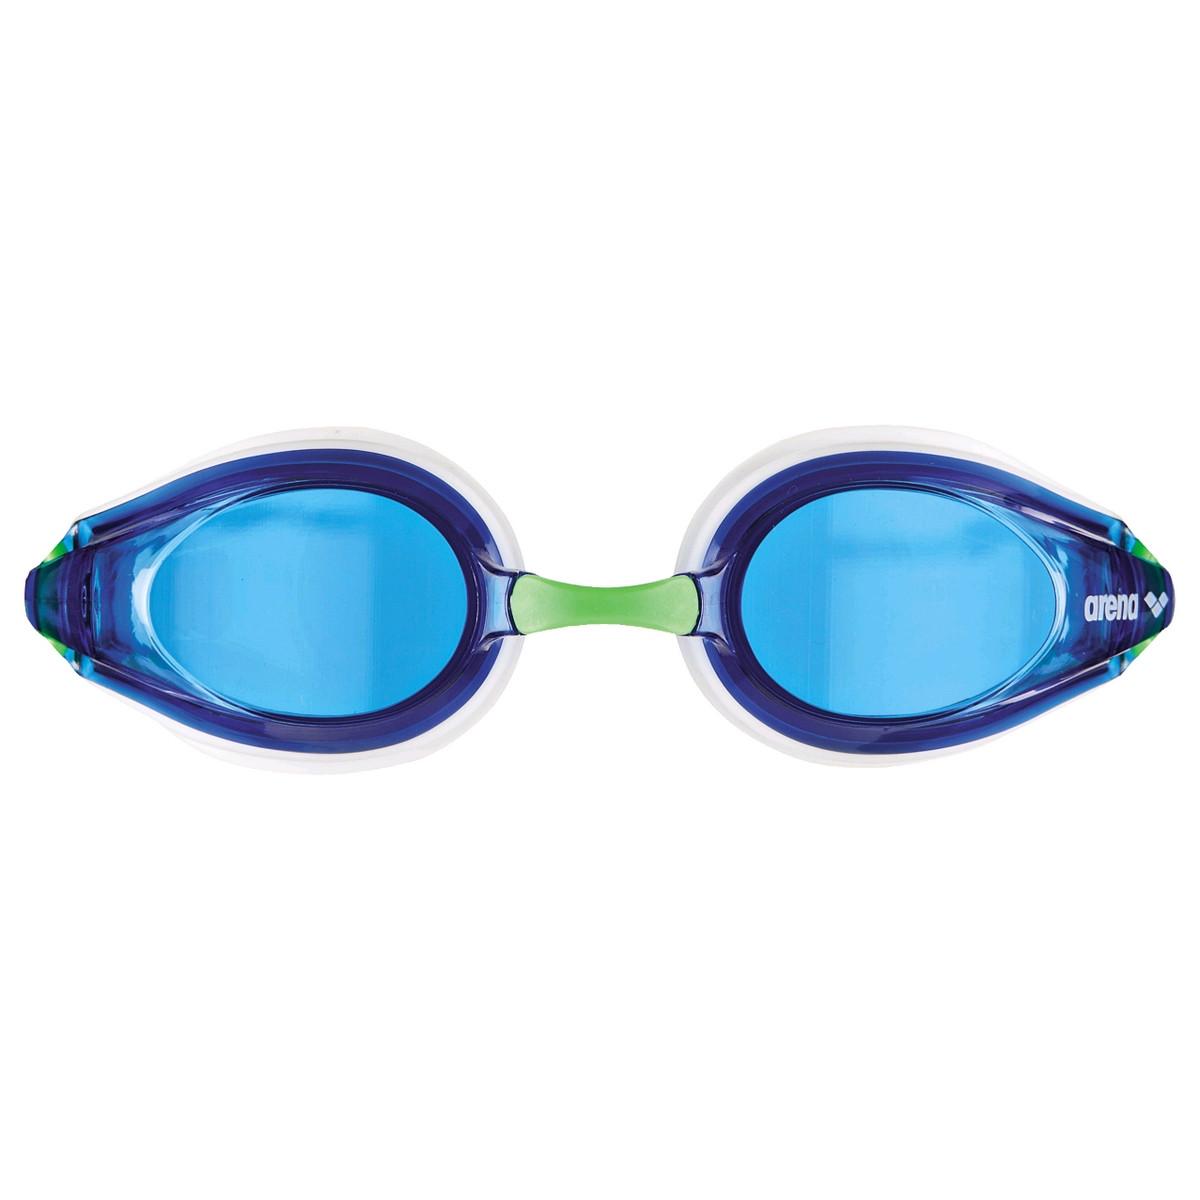 Очки для плавания arena TRACKS (Код:92341-067)